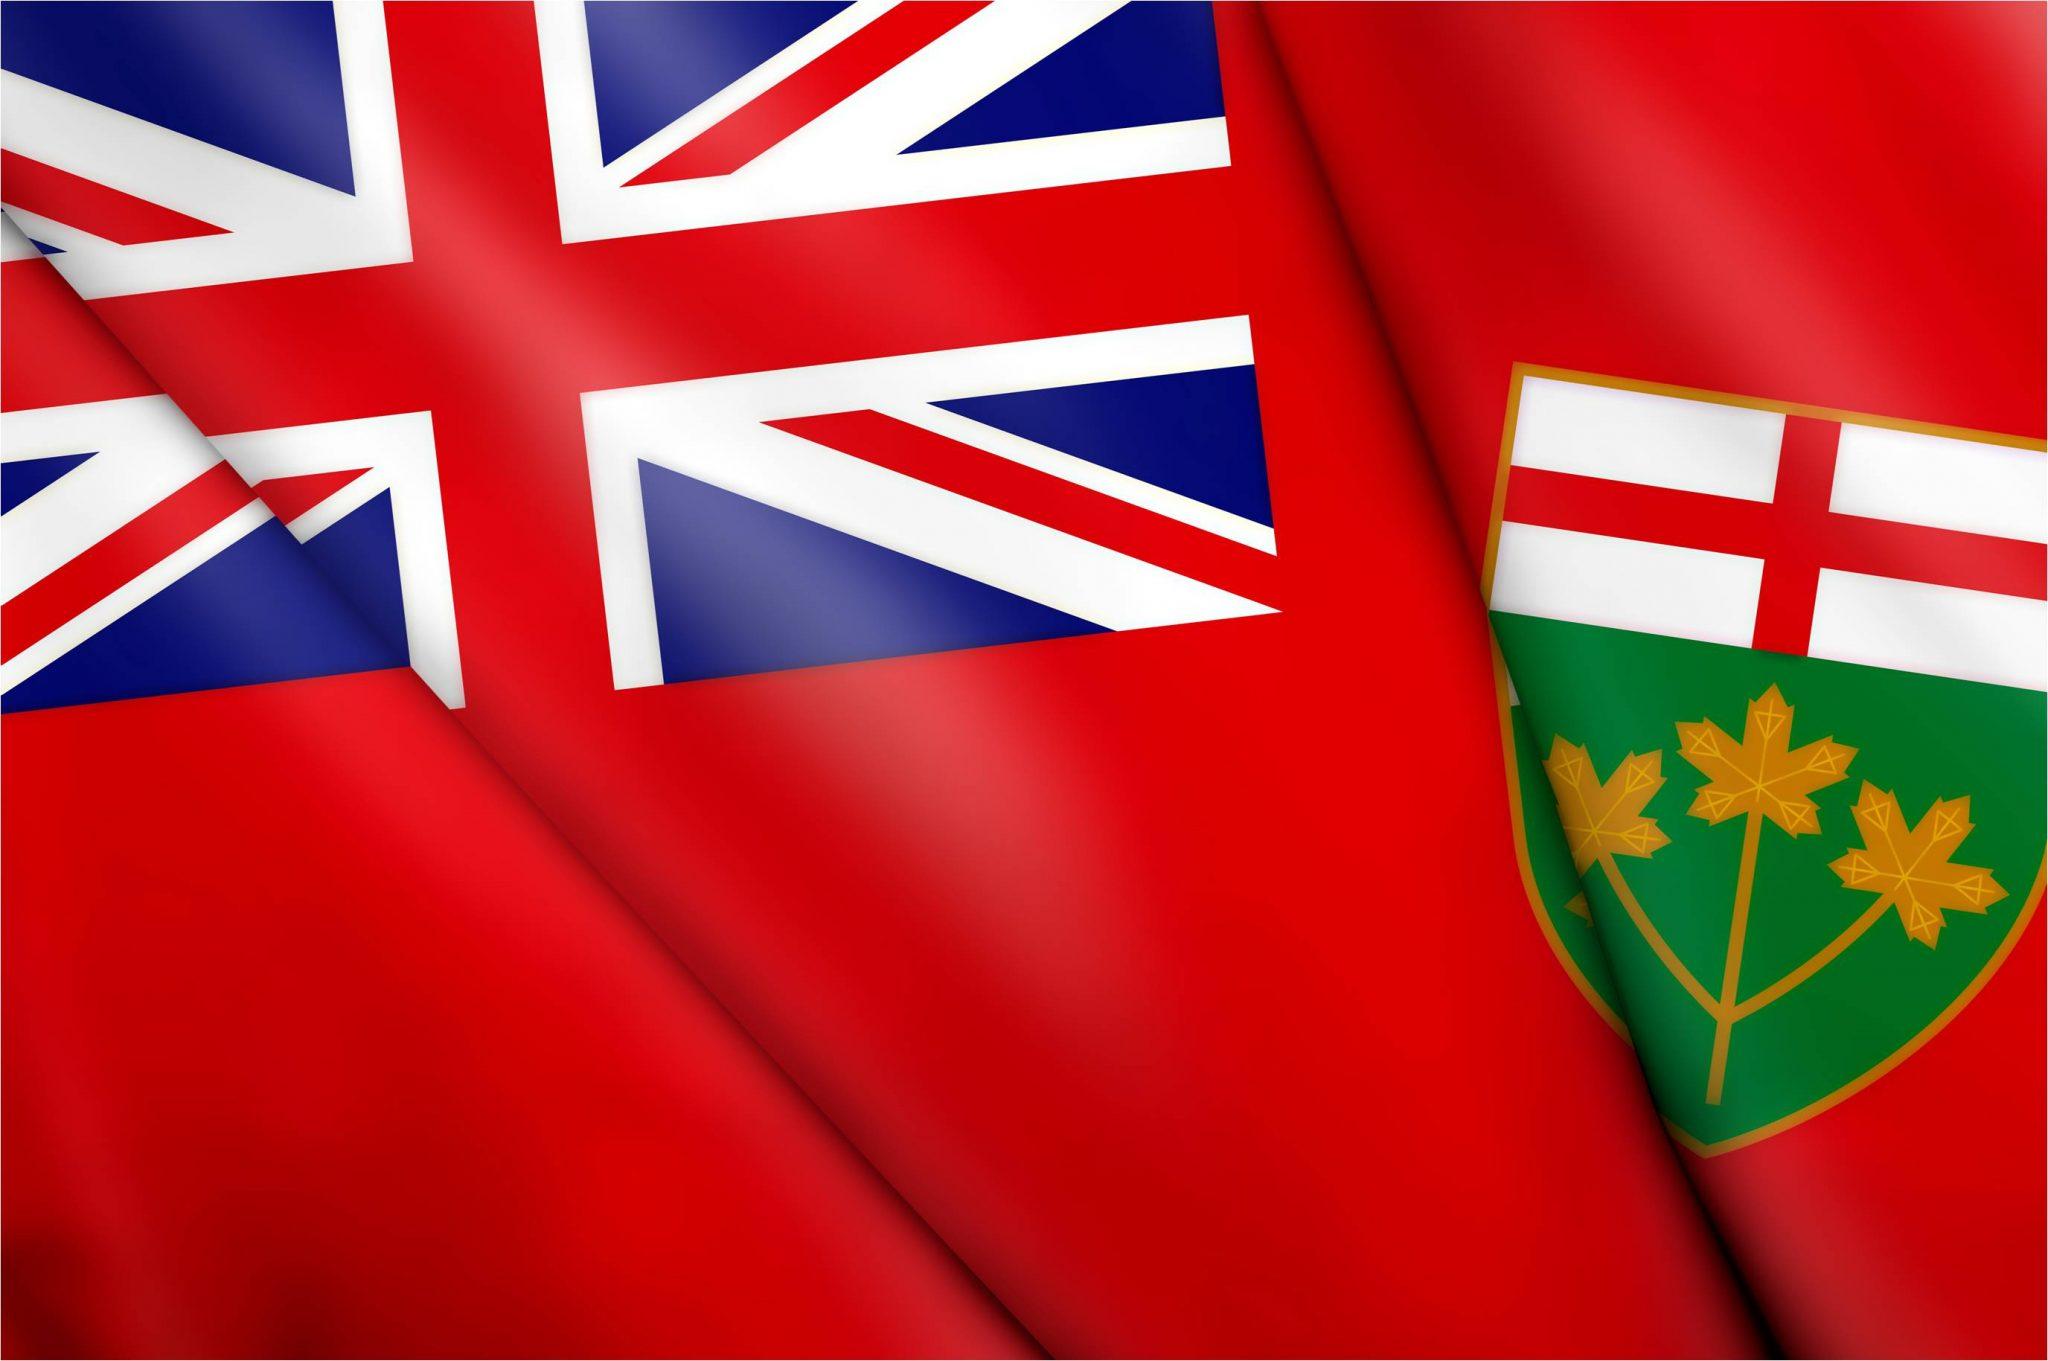 www.ontarioimmigration.ca